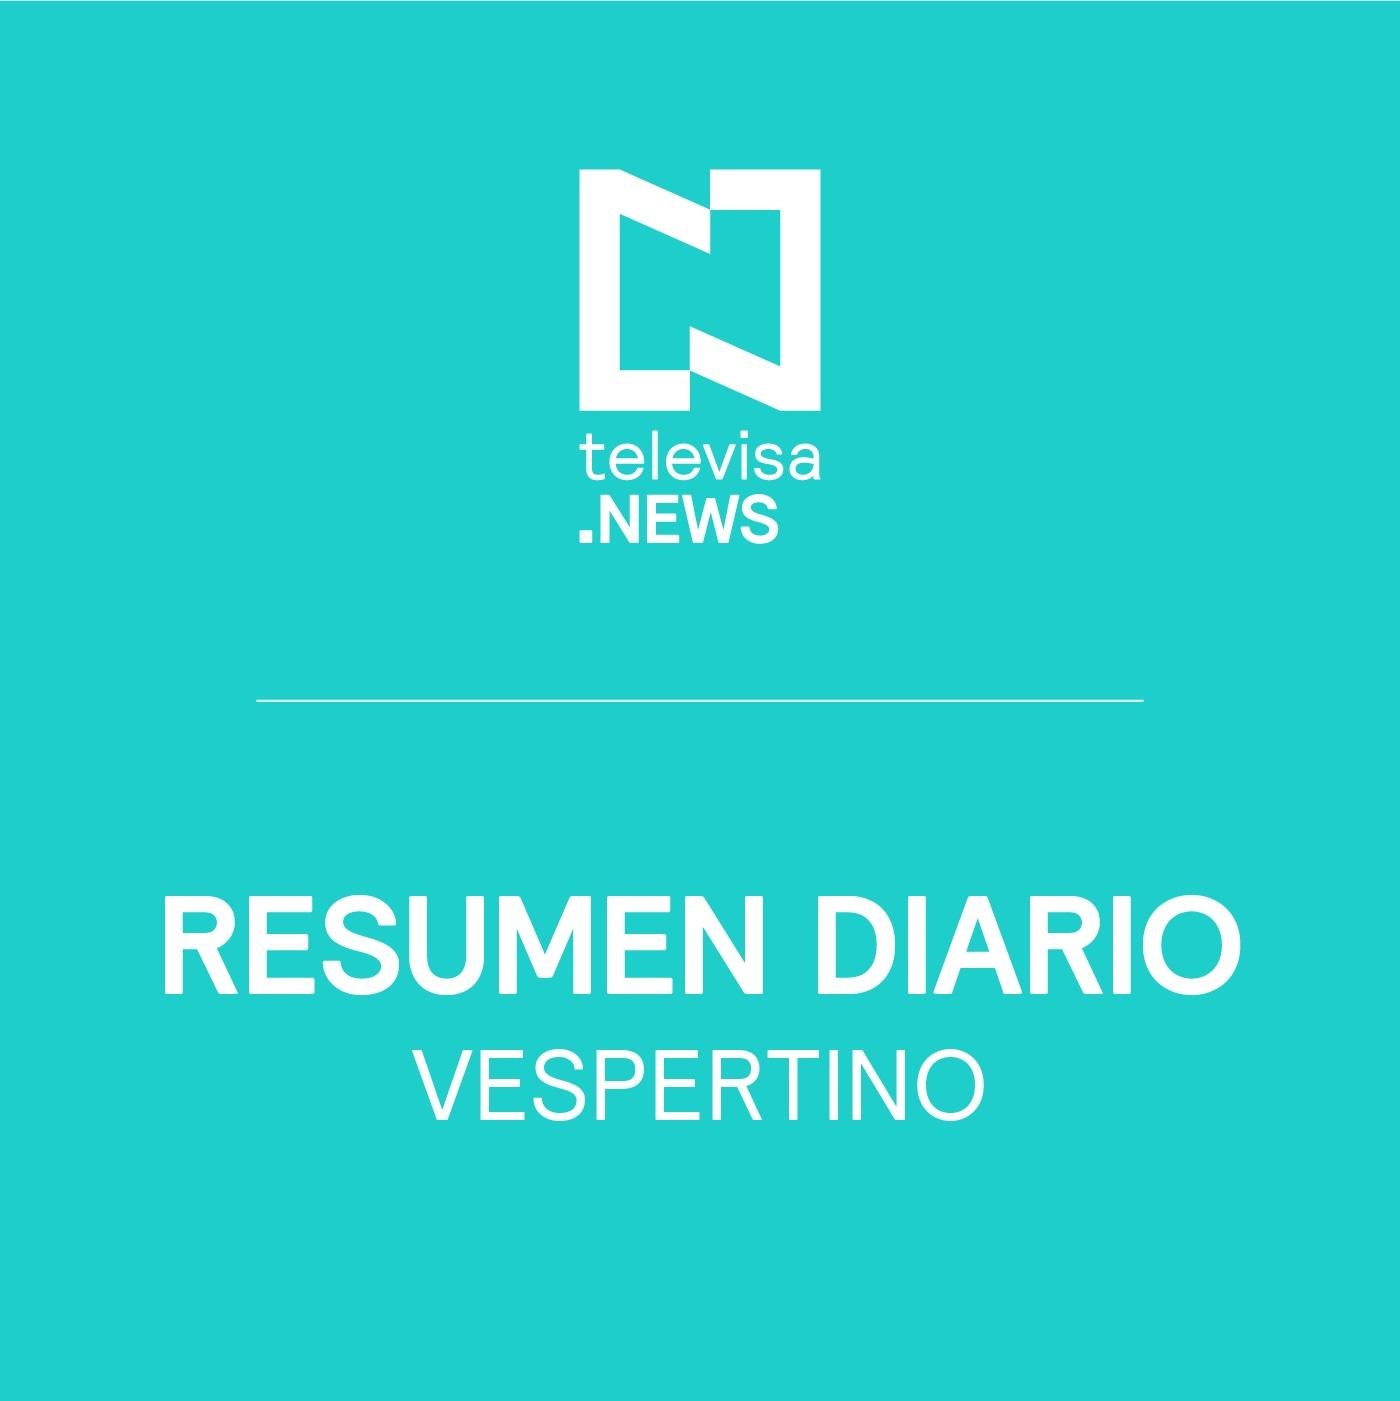 NT_Resumen Diario_VESP (1)